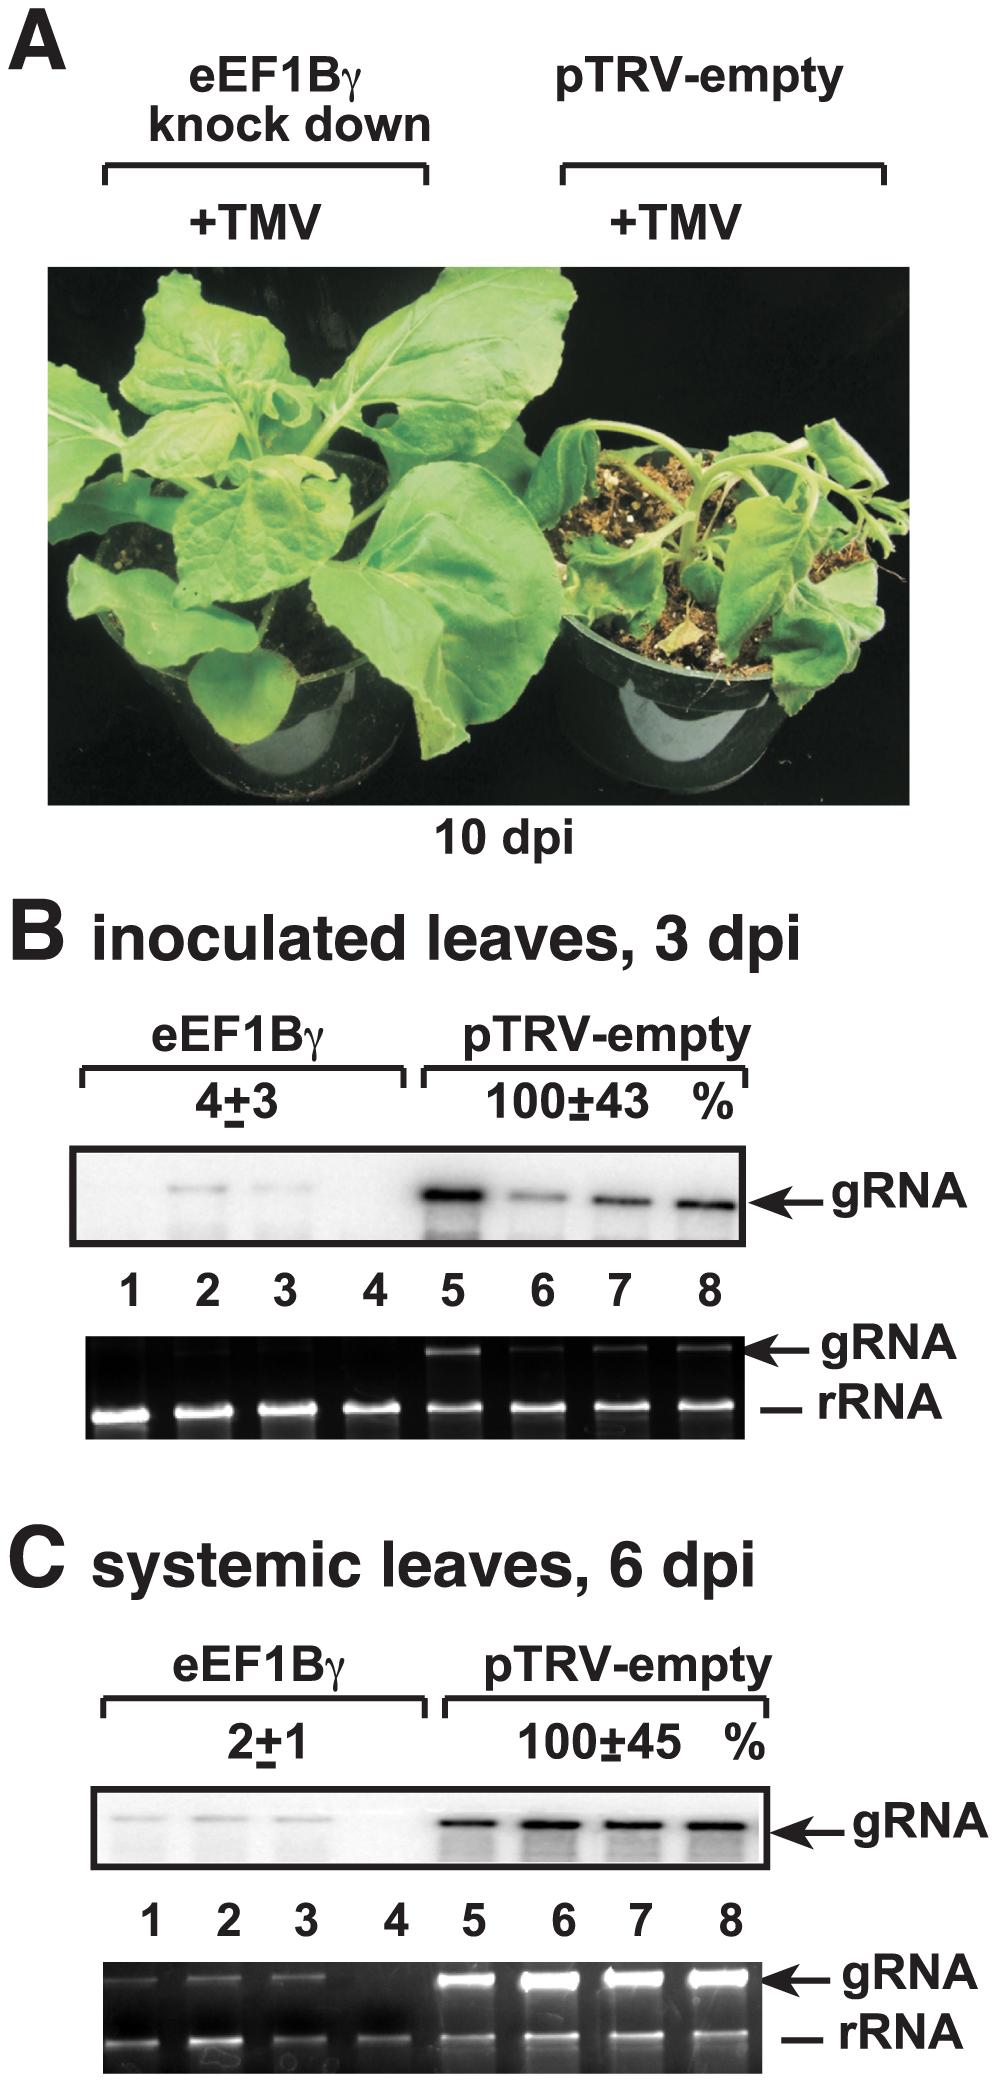 Knockdown of eEF1Bγ inhibits TMV RNA replication in <i>N. benthamiana</i> plants.